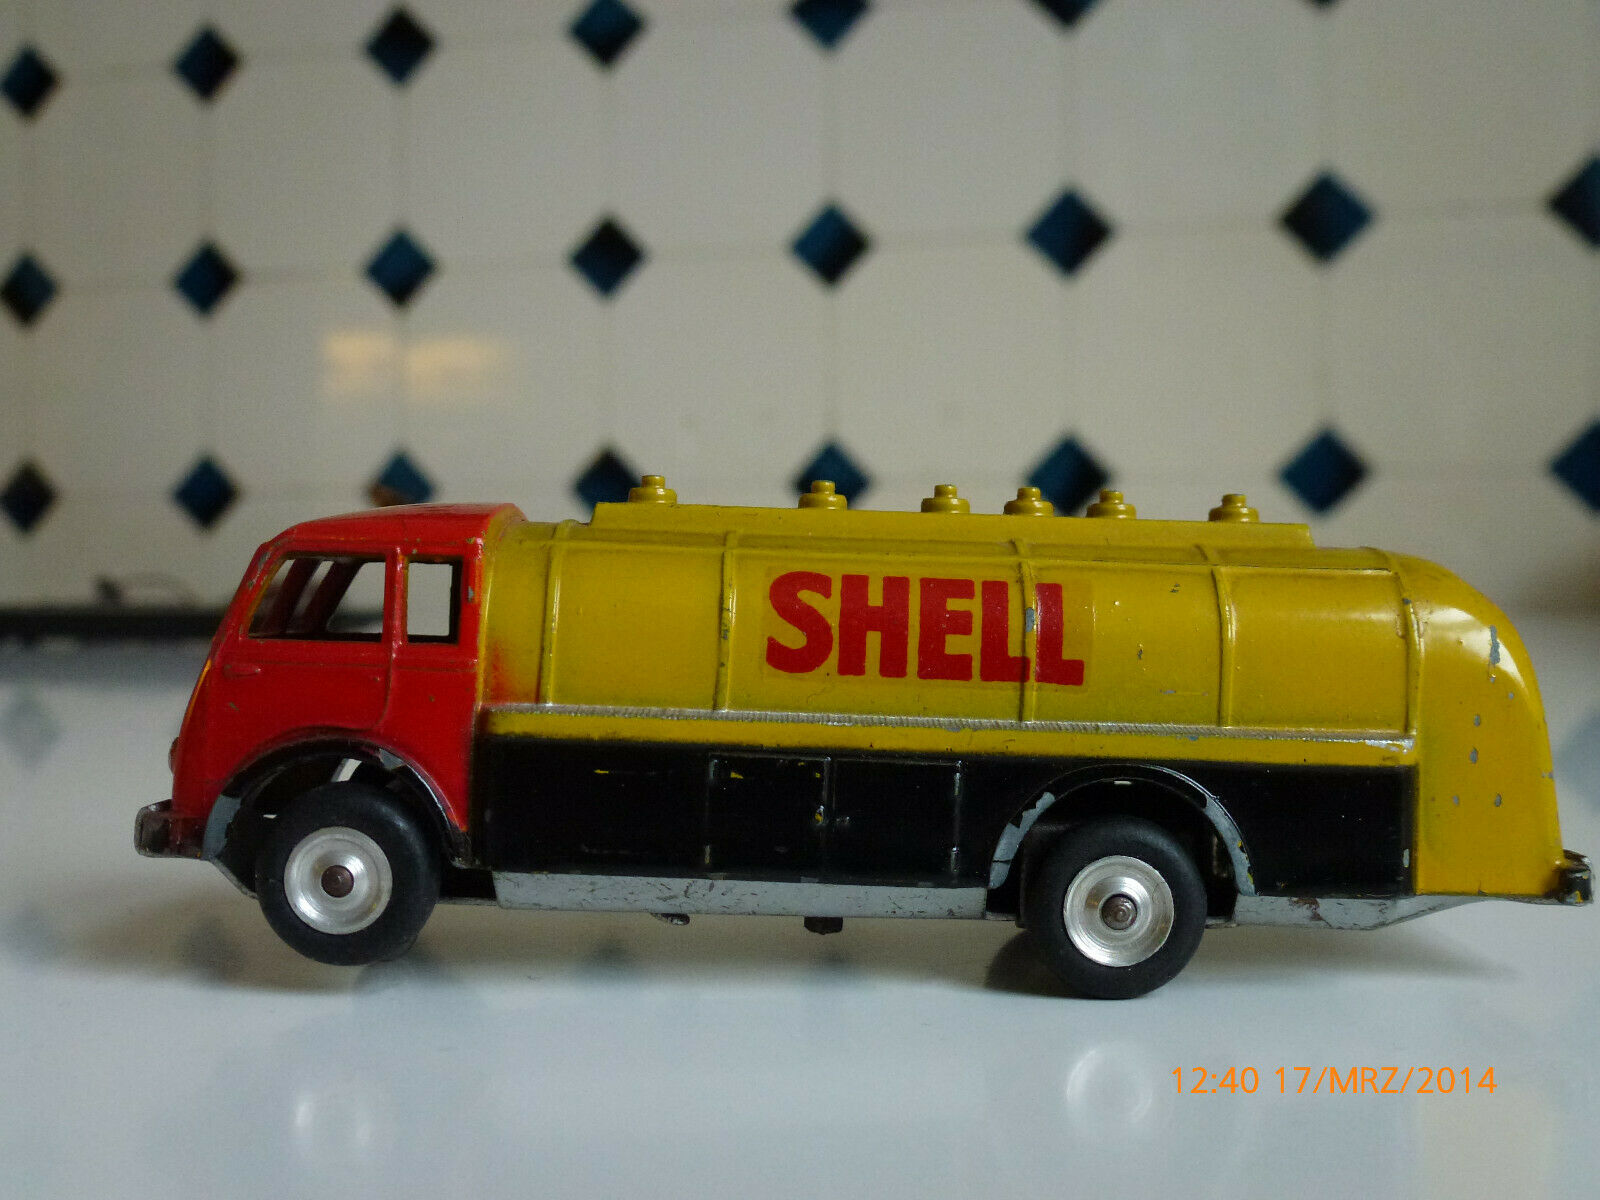 Shell Tanker CIJ aufziehbar ca. 1960, gebraucht aber einwandfrei